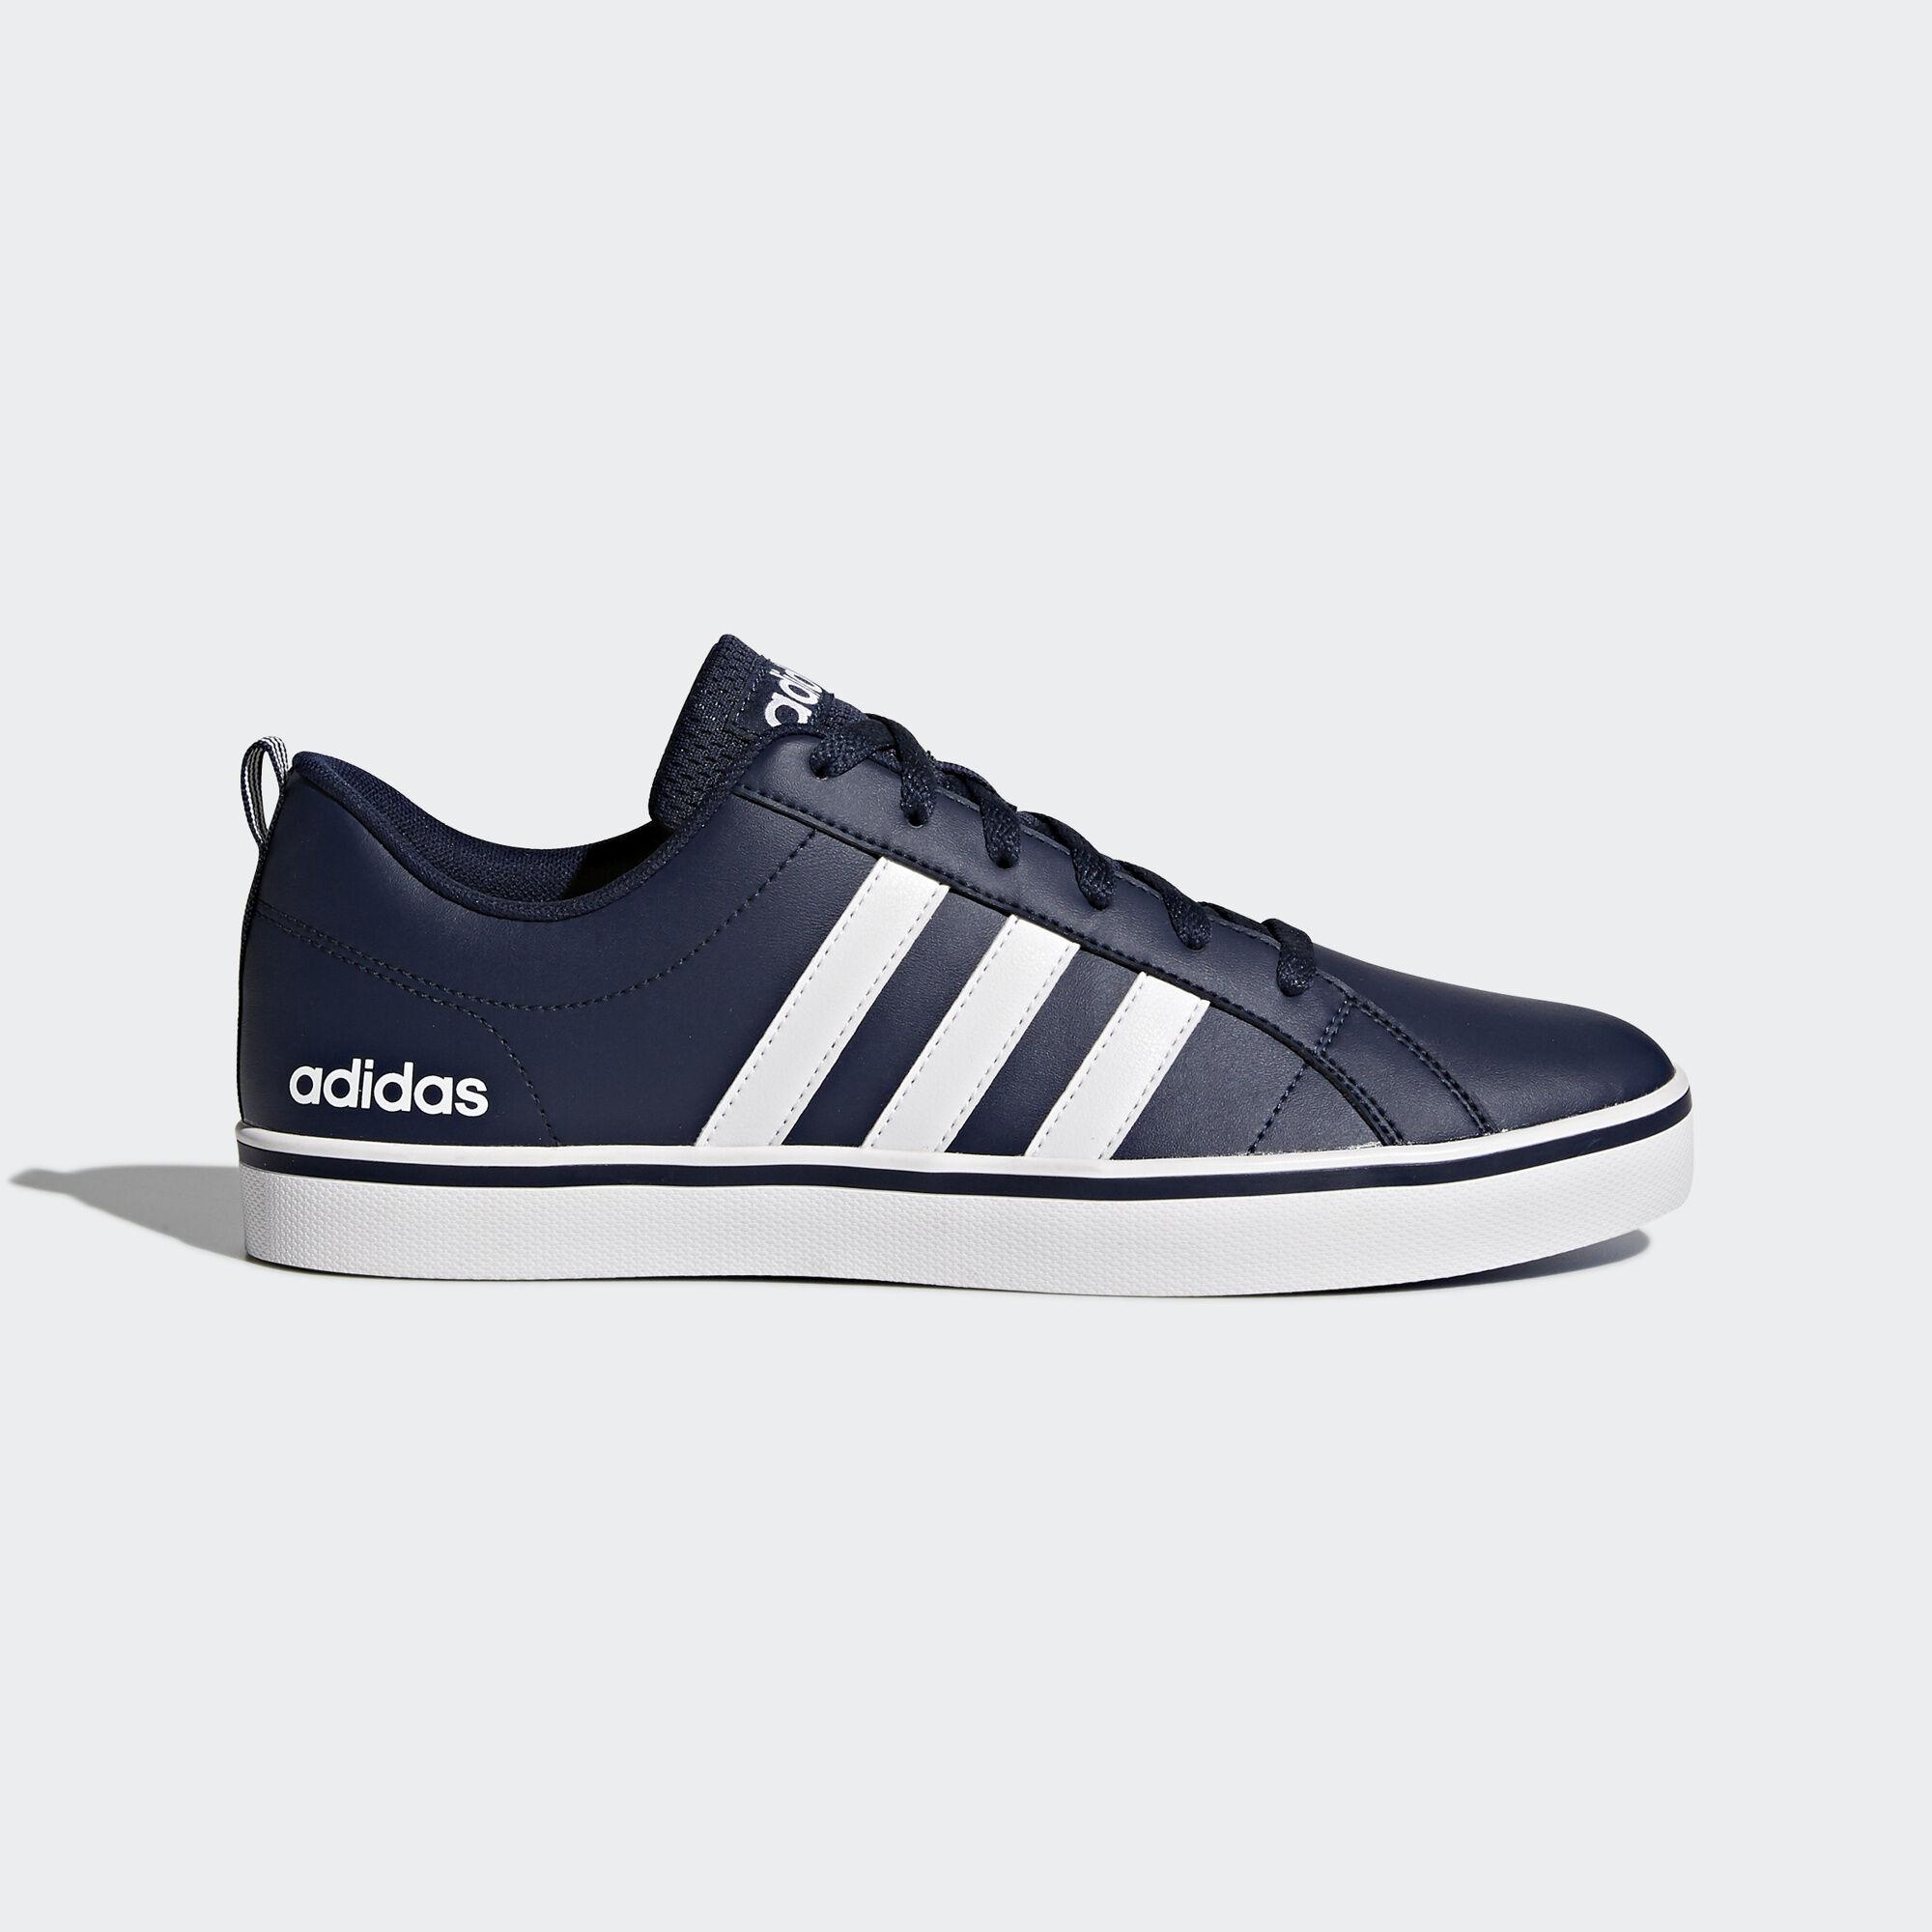 01 Standard Sw Sfrm Adidas Vs Pace Blue